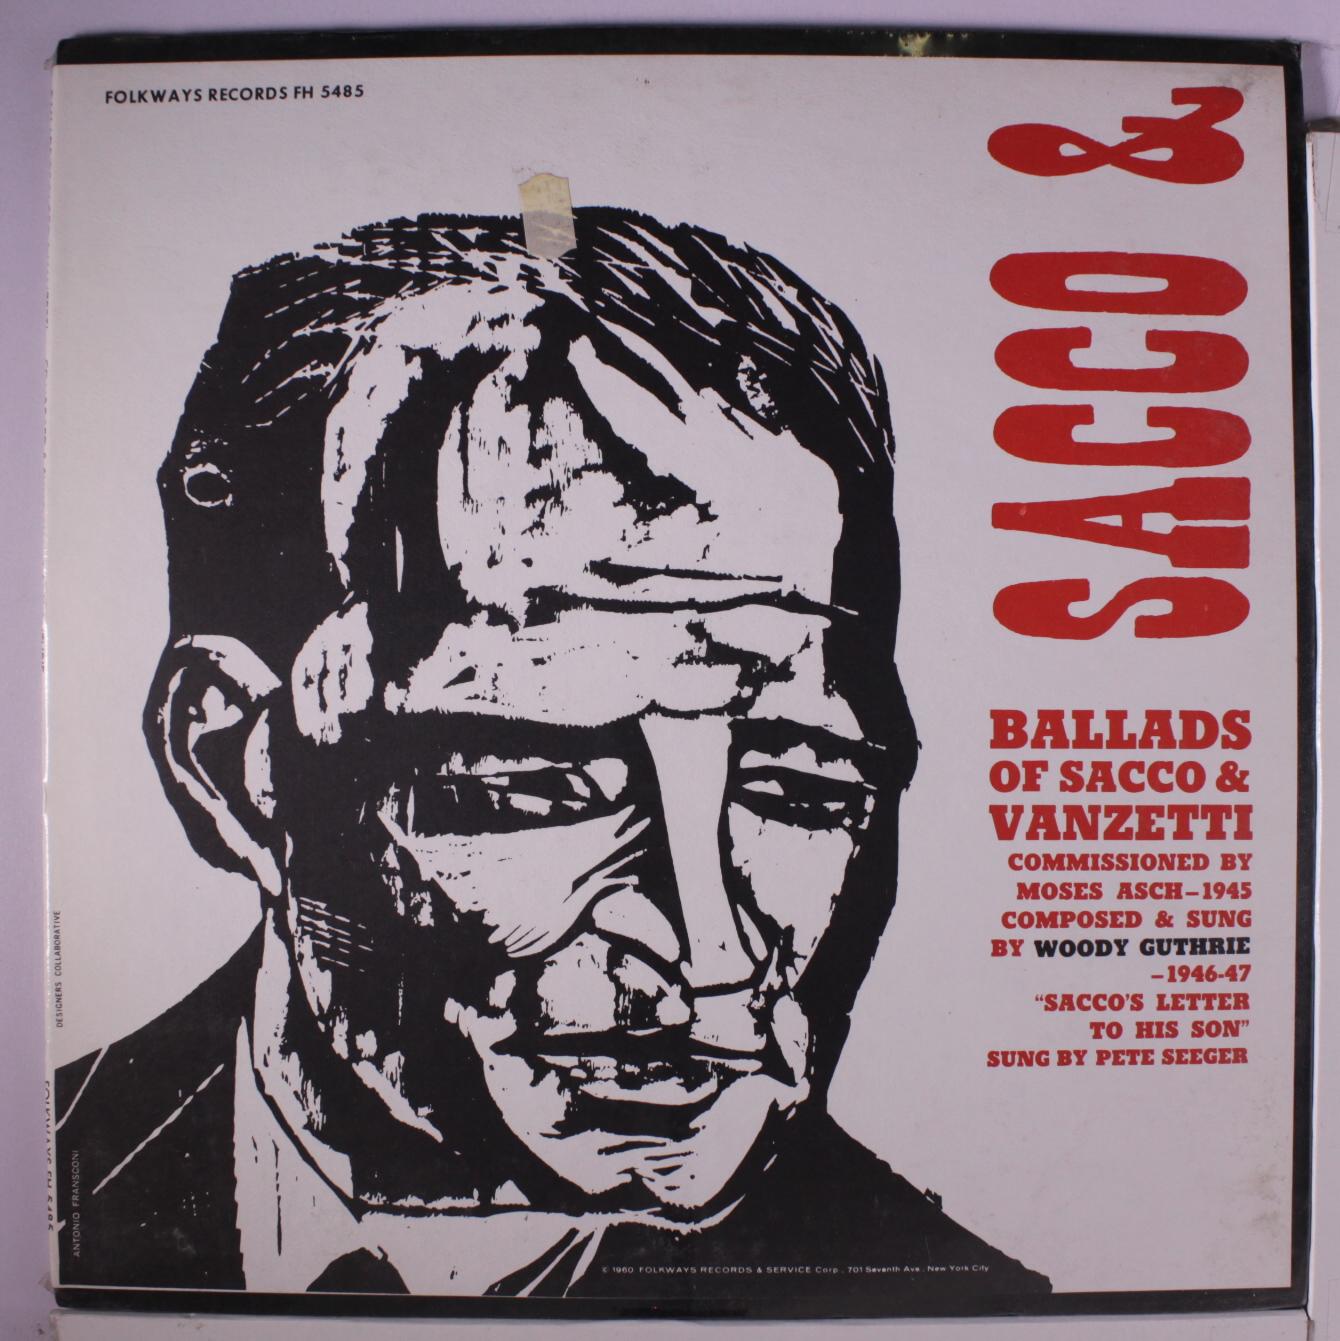 Ballads of Sacco & Vanzetti